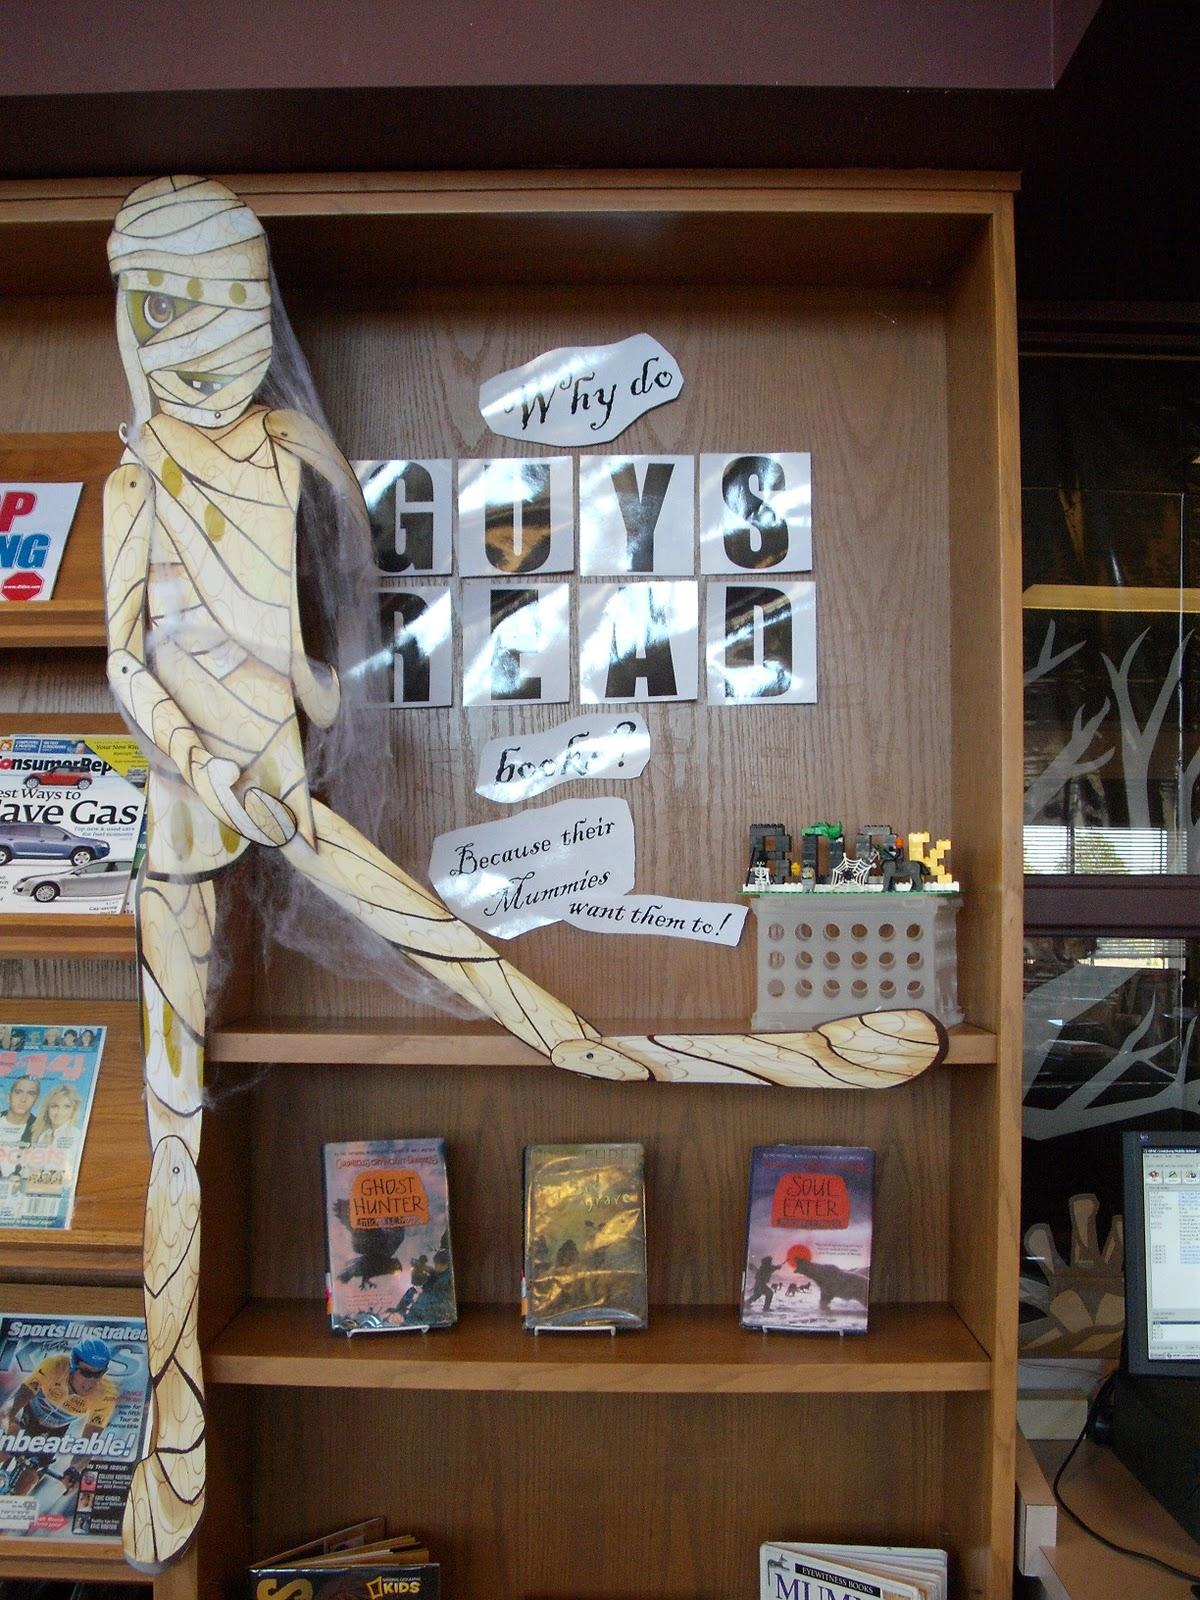 Creative Library Displays